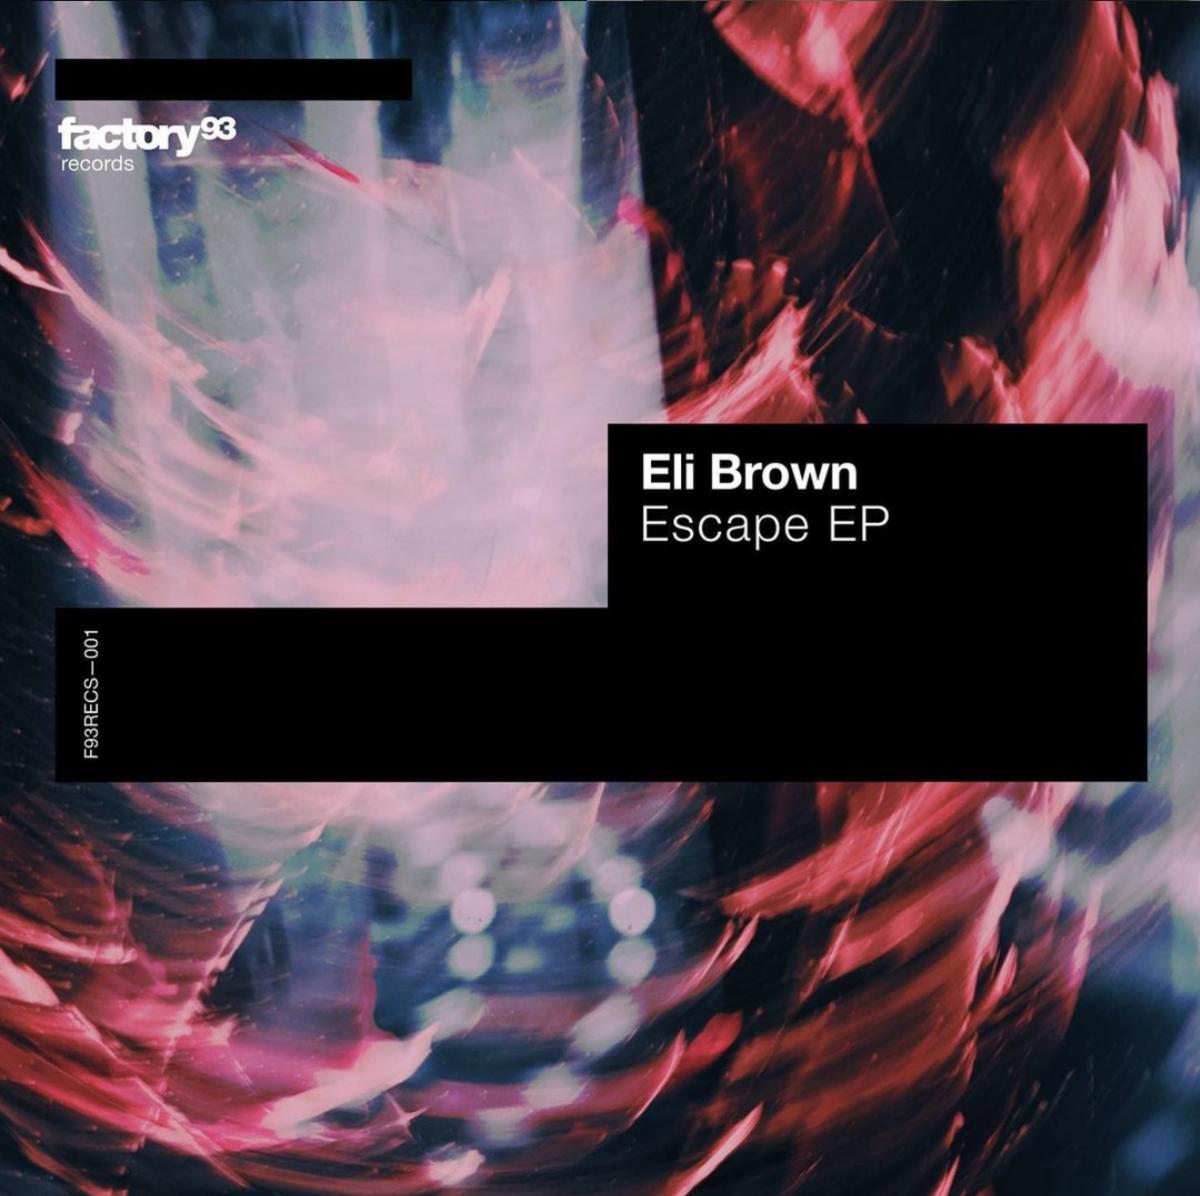 Eli Brown debuts Insomniac's new imprint Factory 93 Records